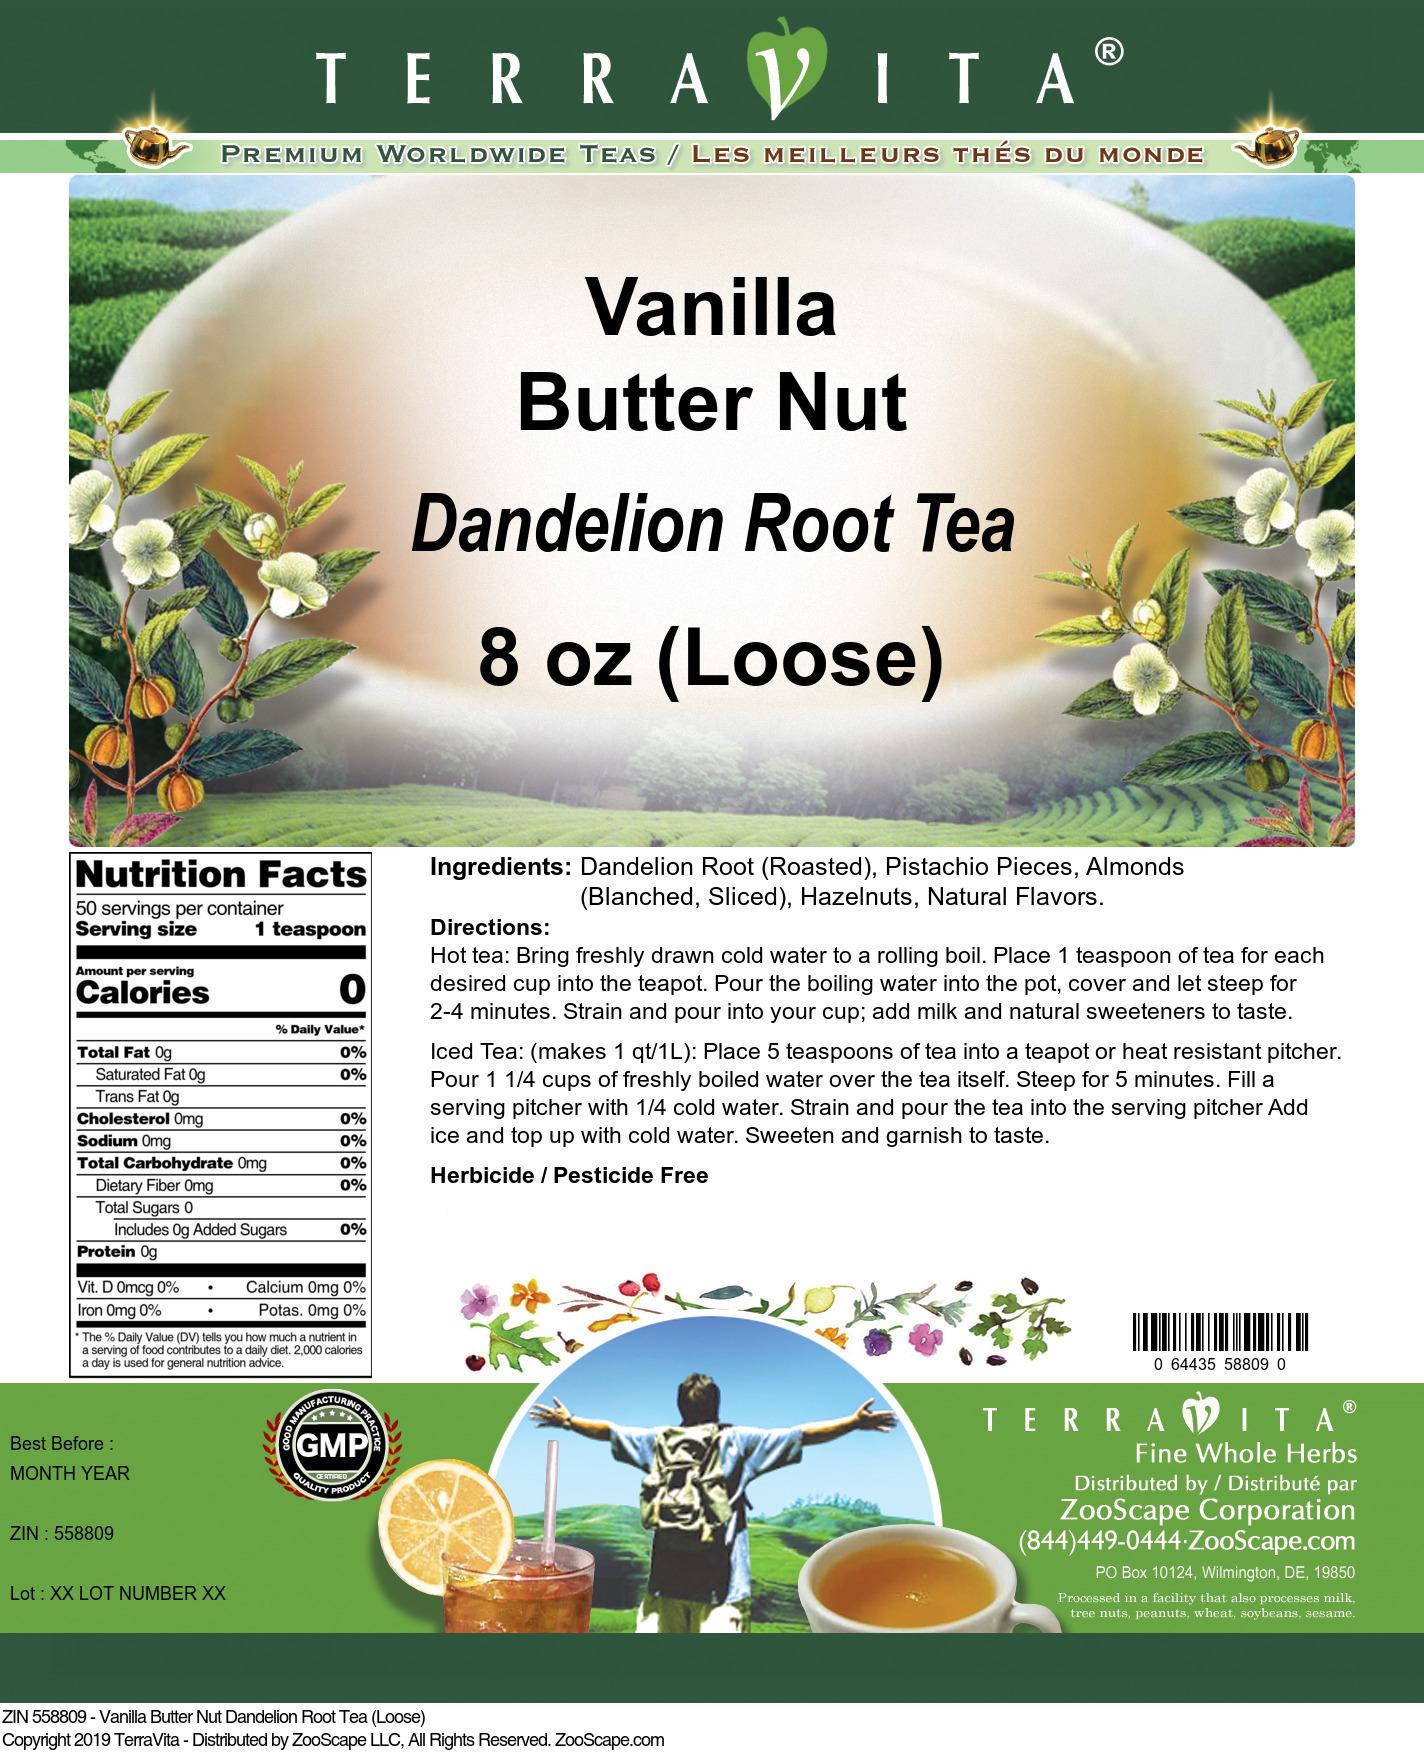 Vanilla Butter Nut Dandelion Root Tea (Loose)